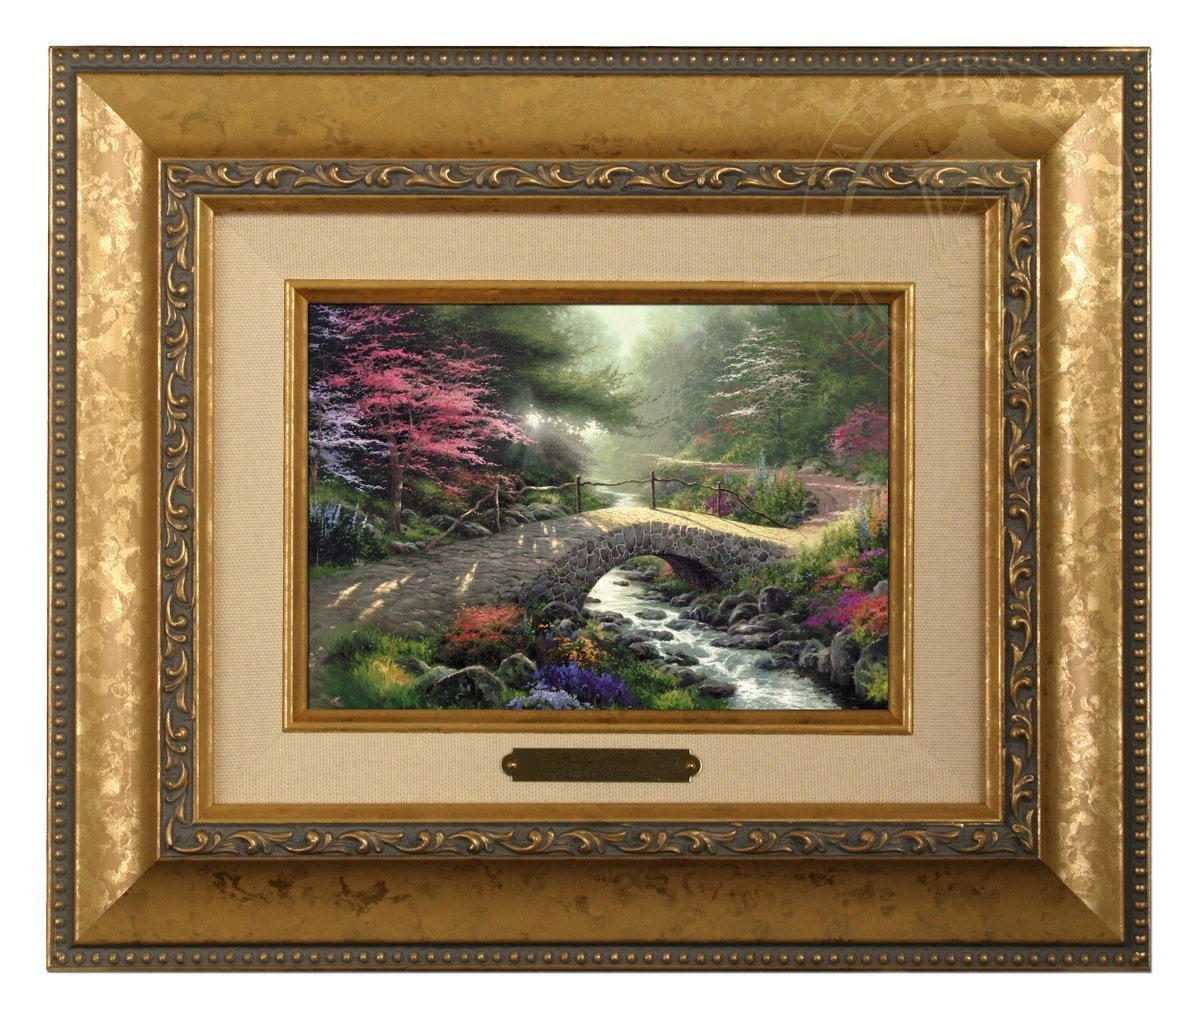 Thomas Kinkade Bridge of Faith Brushwork (Gold Frame)